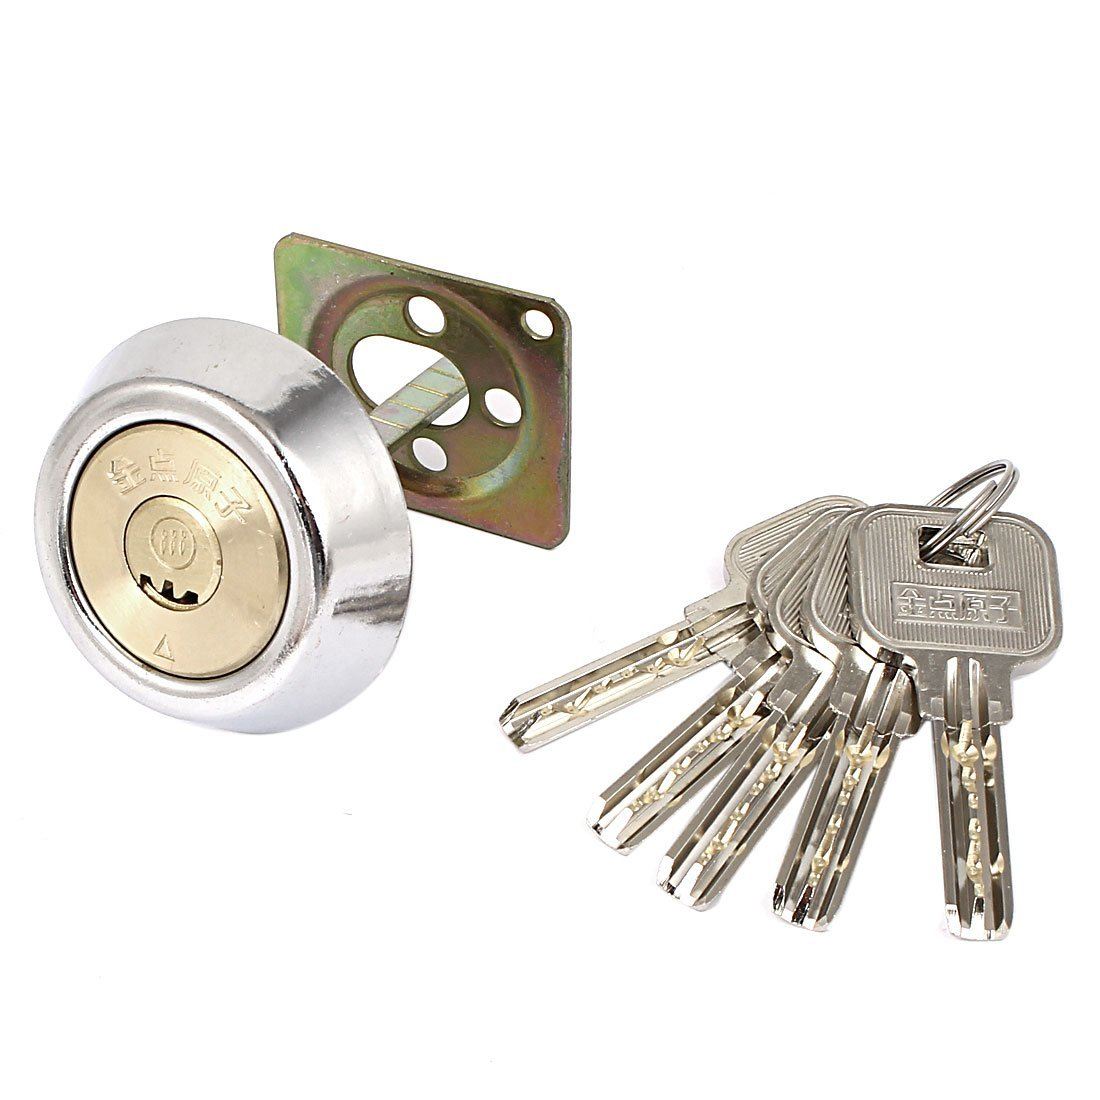 uxcell Office Door Gate Anti-theft Security Copper Lock Core w 5 Keys